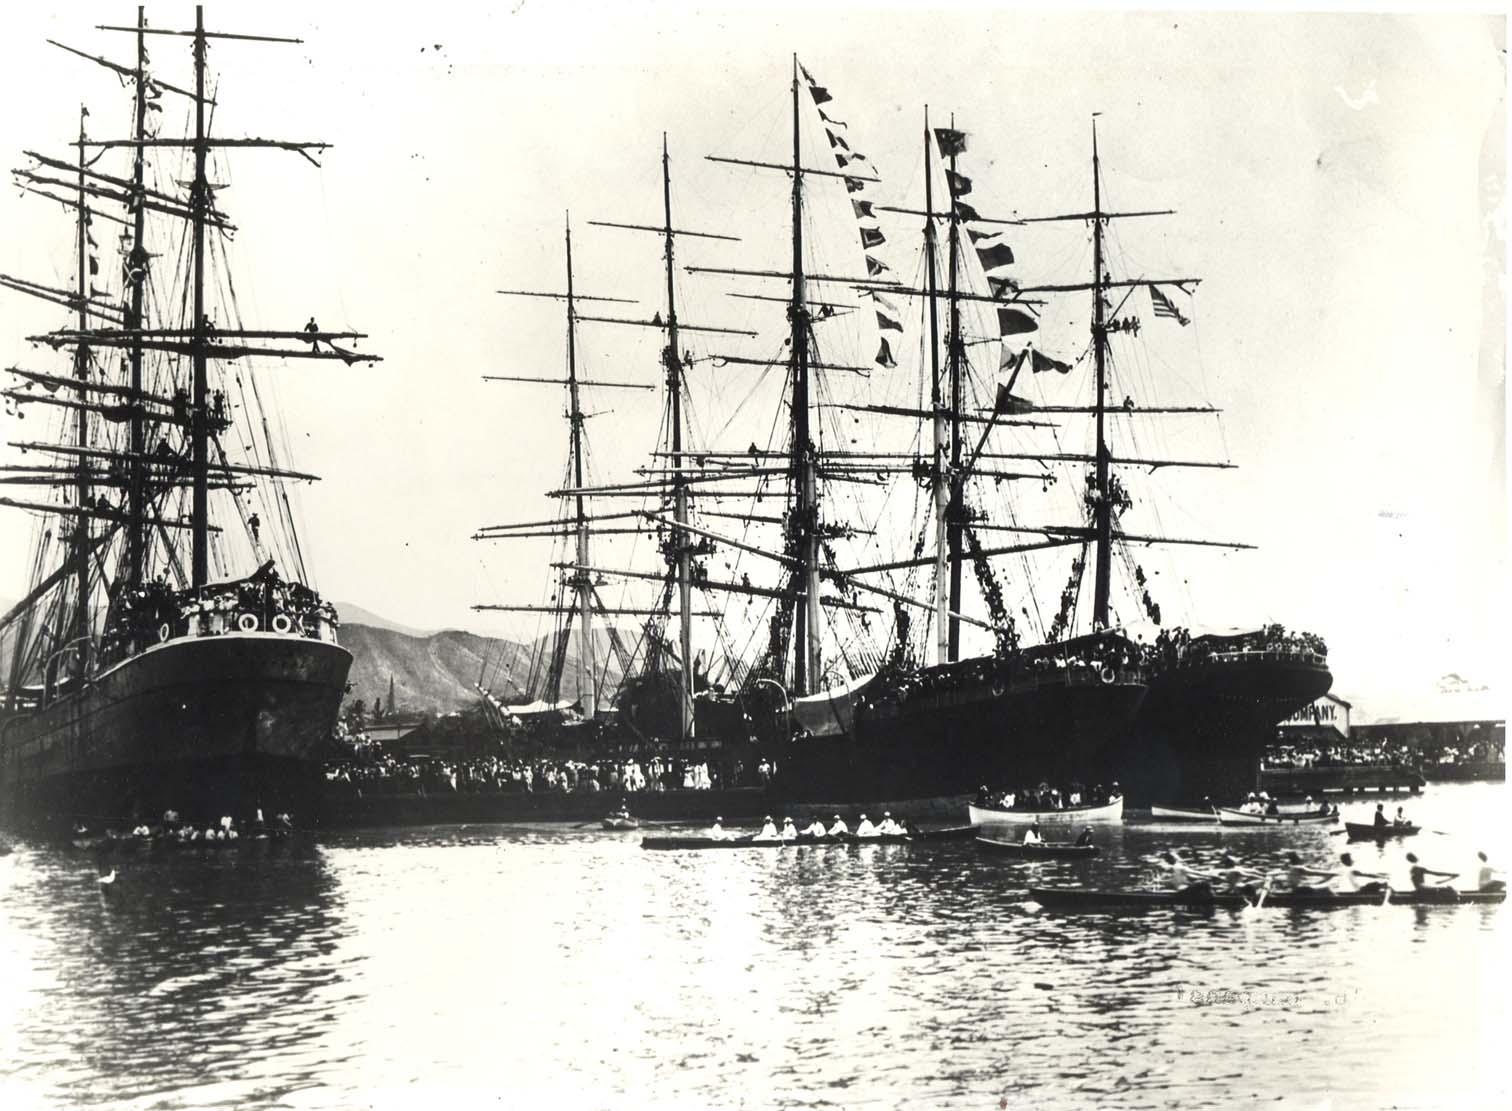 Honolulu harbor in 1900.